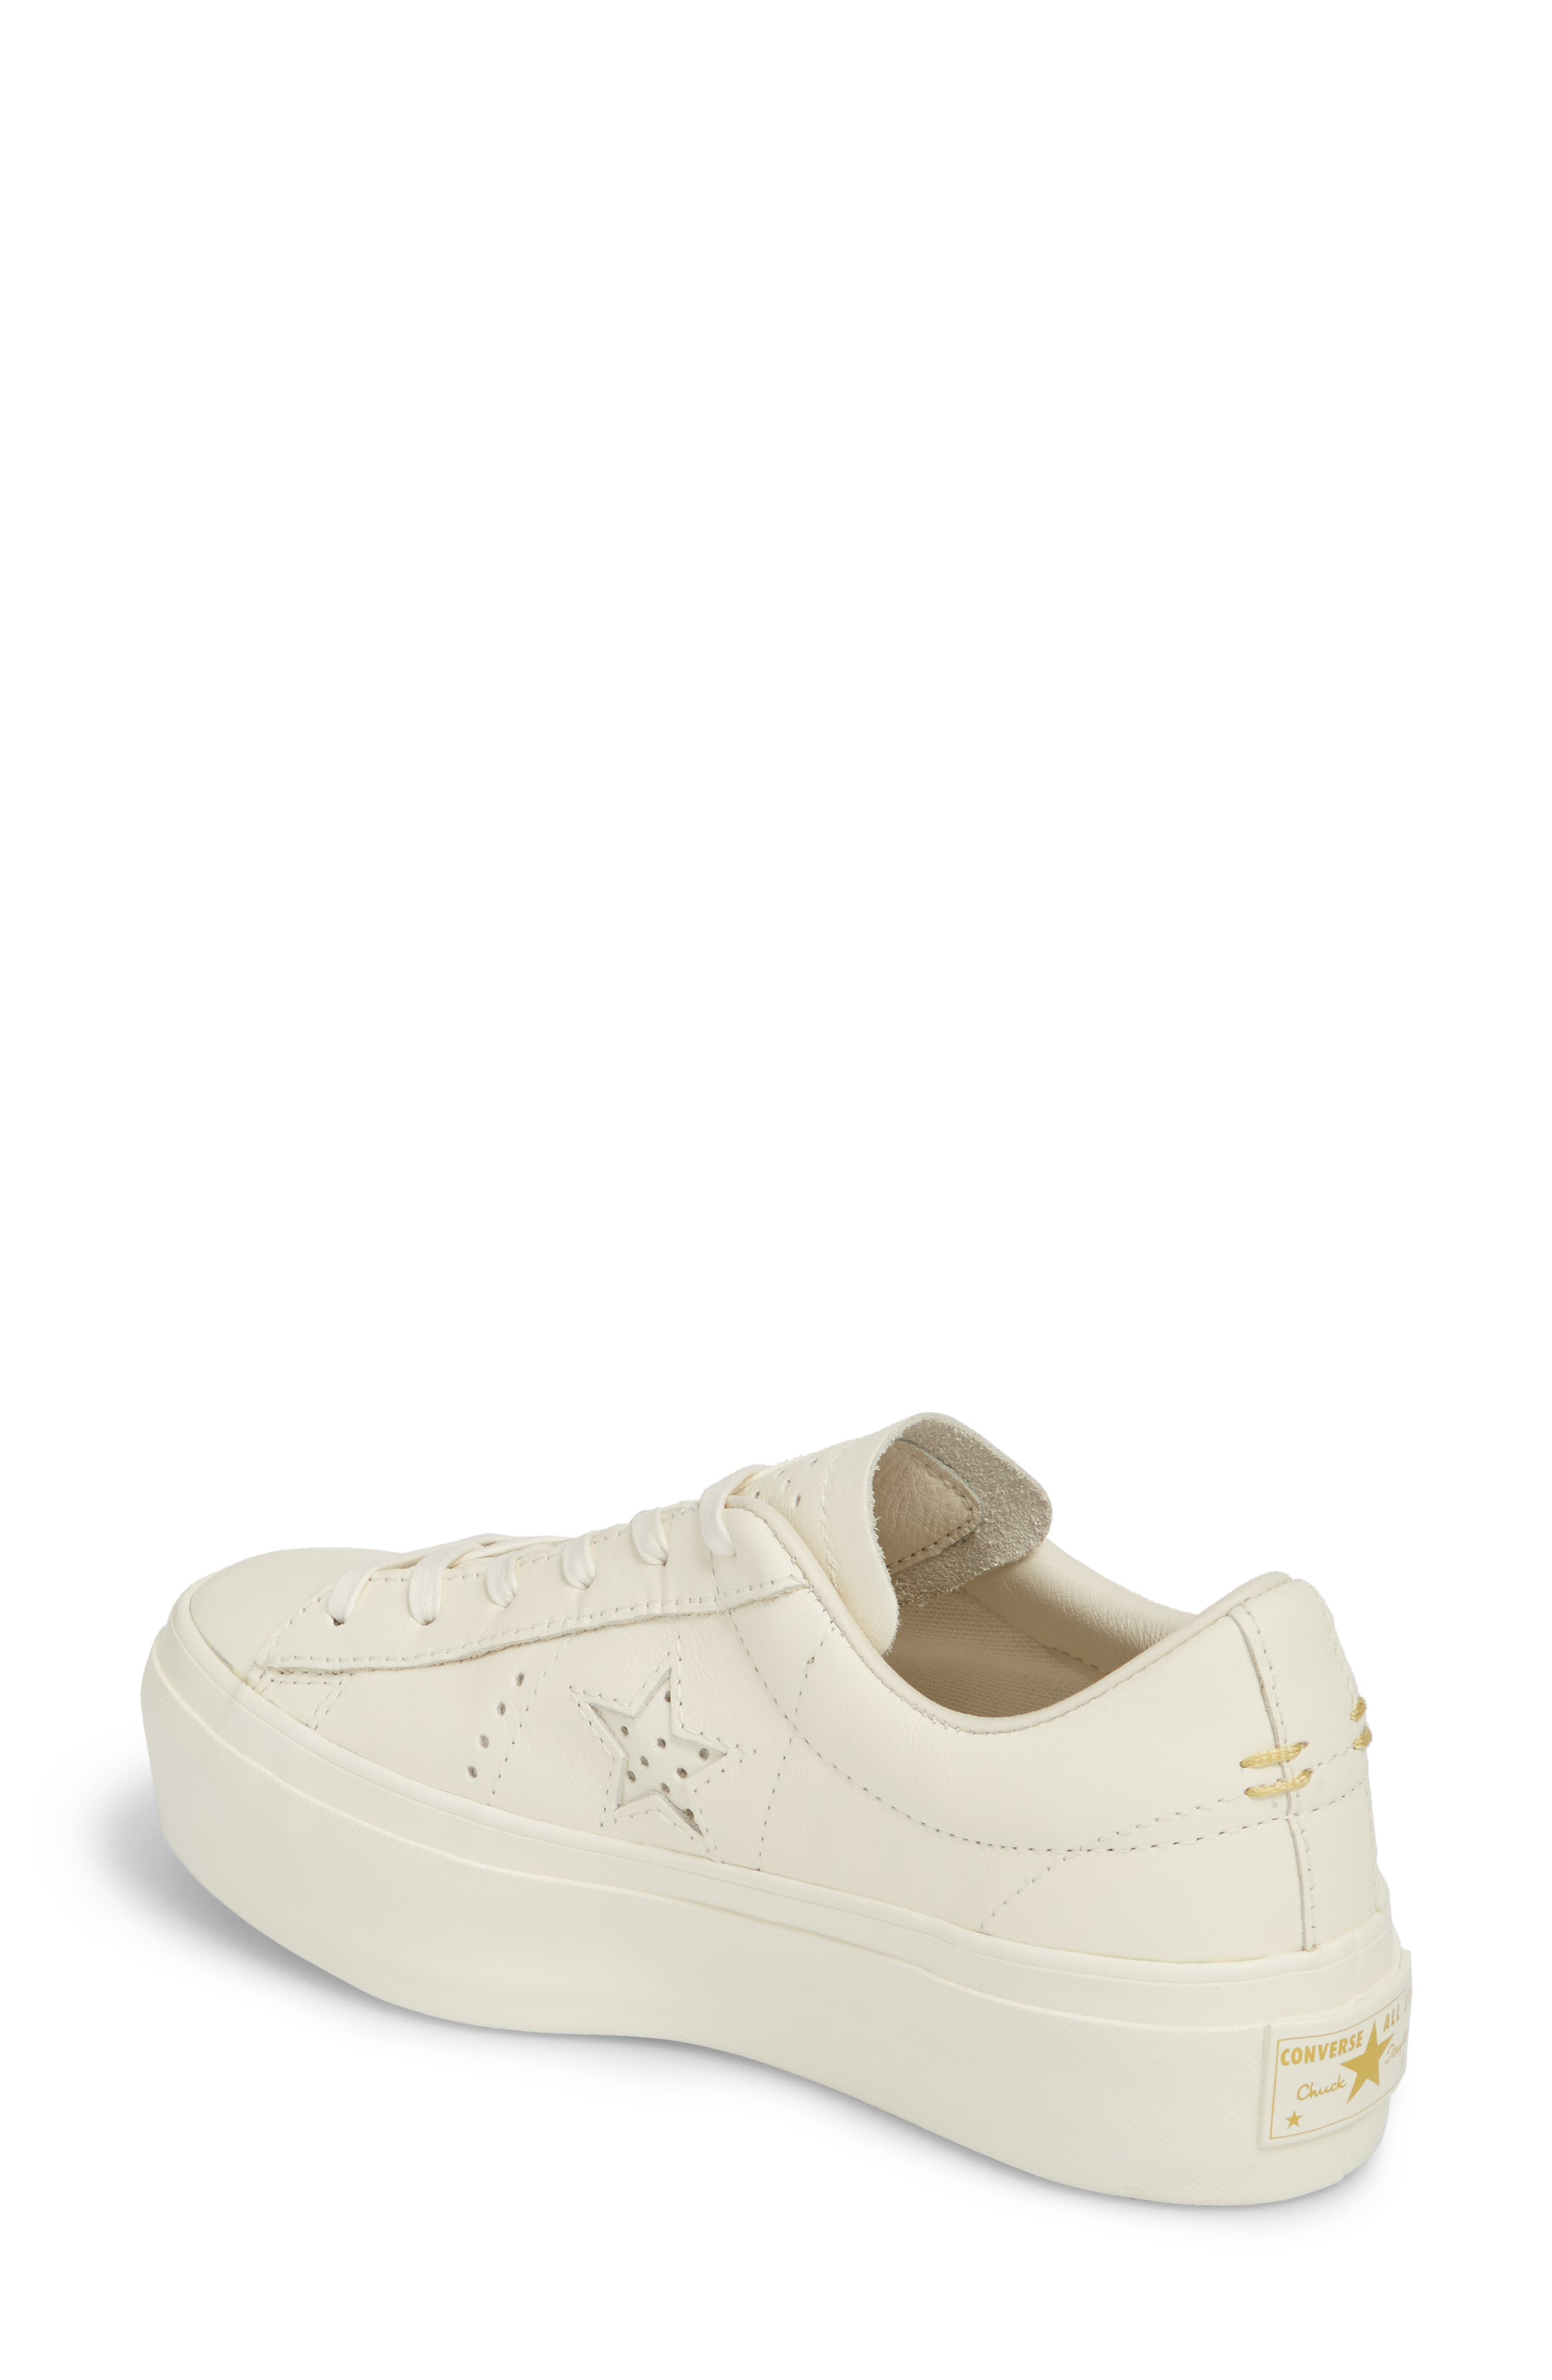 Chuck Taylor<sup>®</sup> All Star<sup>®</sup> One Star Platform Sneaker,                             Alternate thumbnail 2, color,                             Egret/ Egret